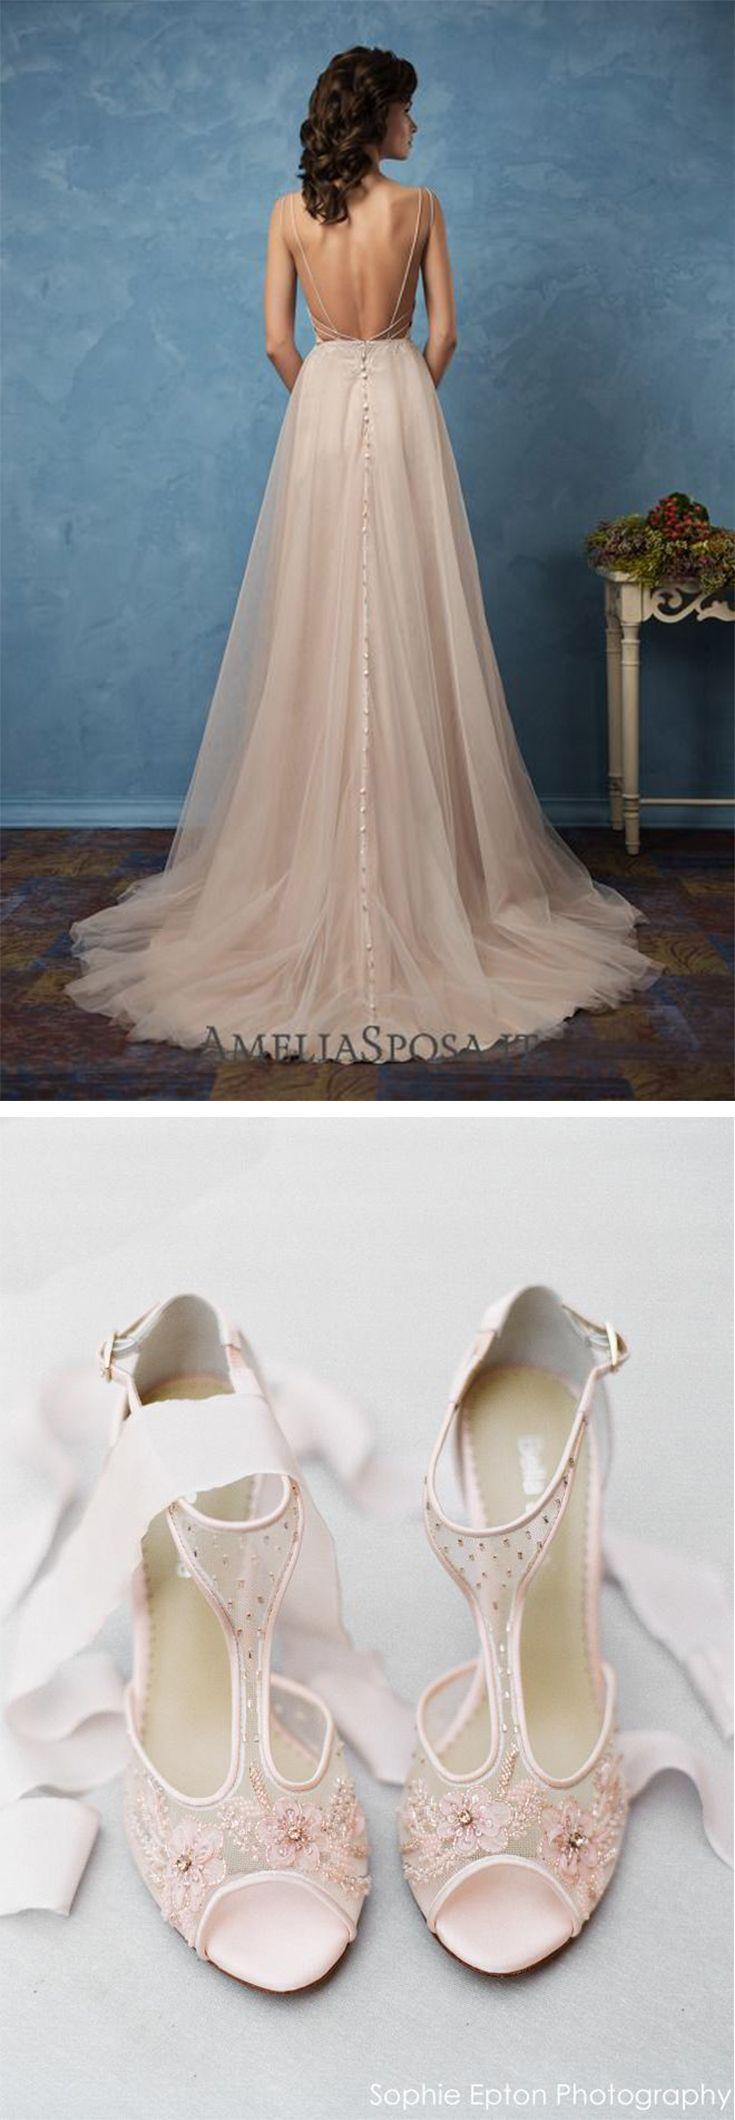 Tstrap beaded wedding shoes paloma blush in wedding dress